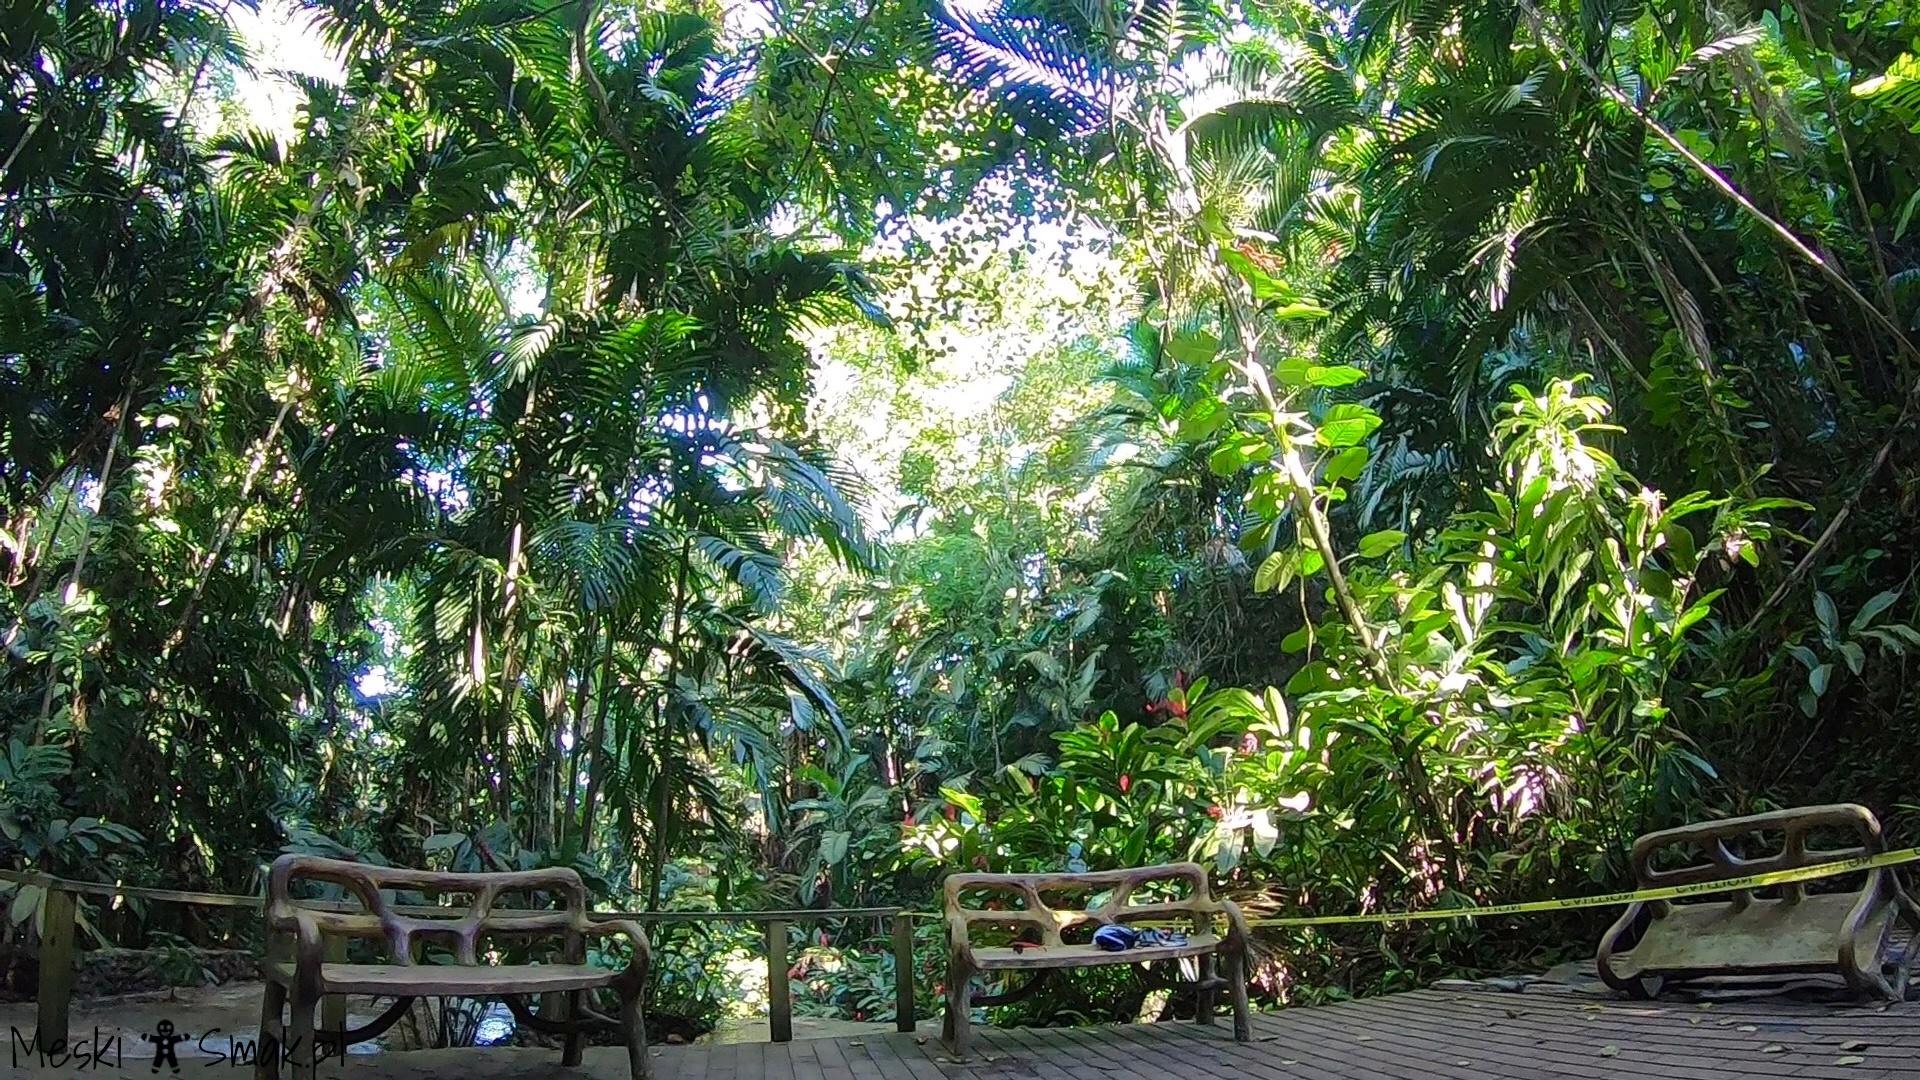 jamajka_The Turtle River Falls & Gardens 2